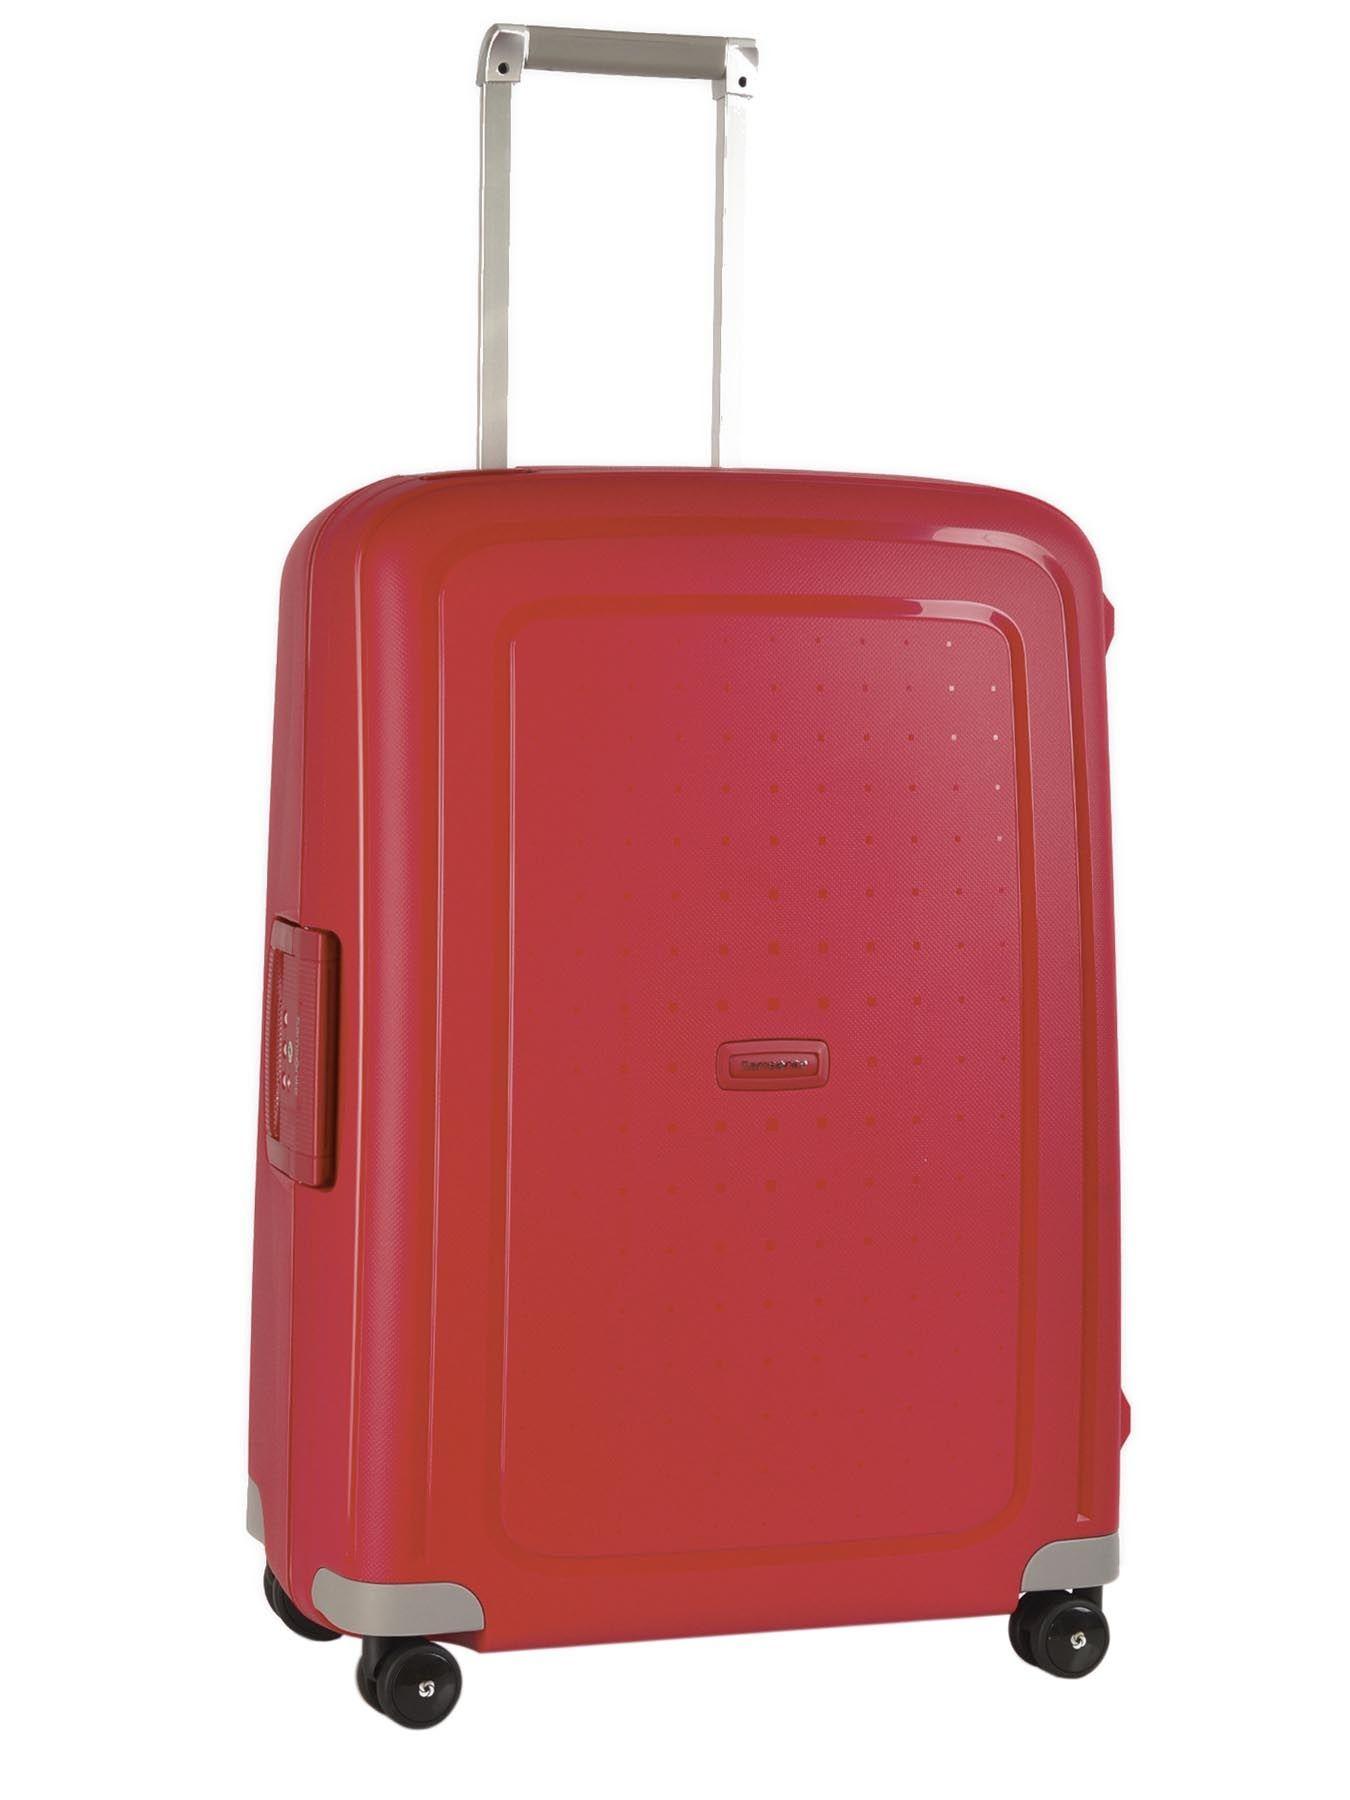 valise rigide samsonite s 39 cure s 39 cure en vente au meilleur prix. Black Bedroom Furniture Sets. Home Design Ideas